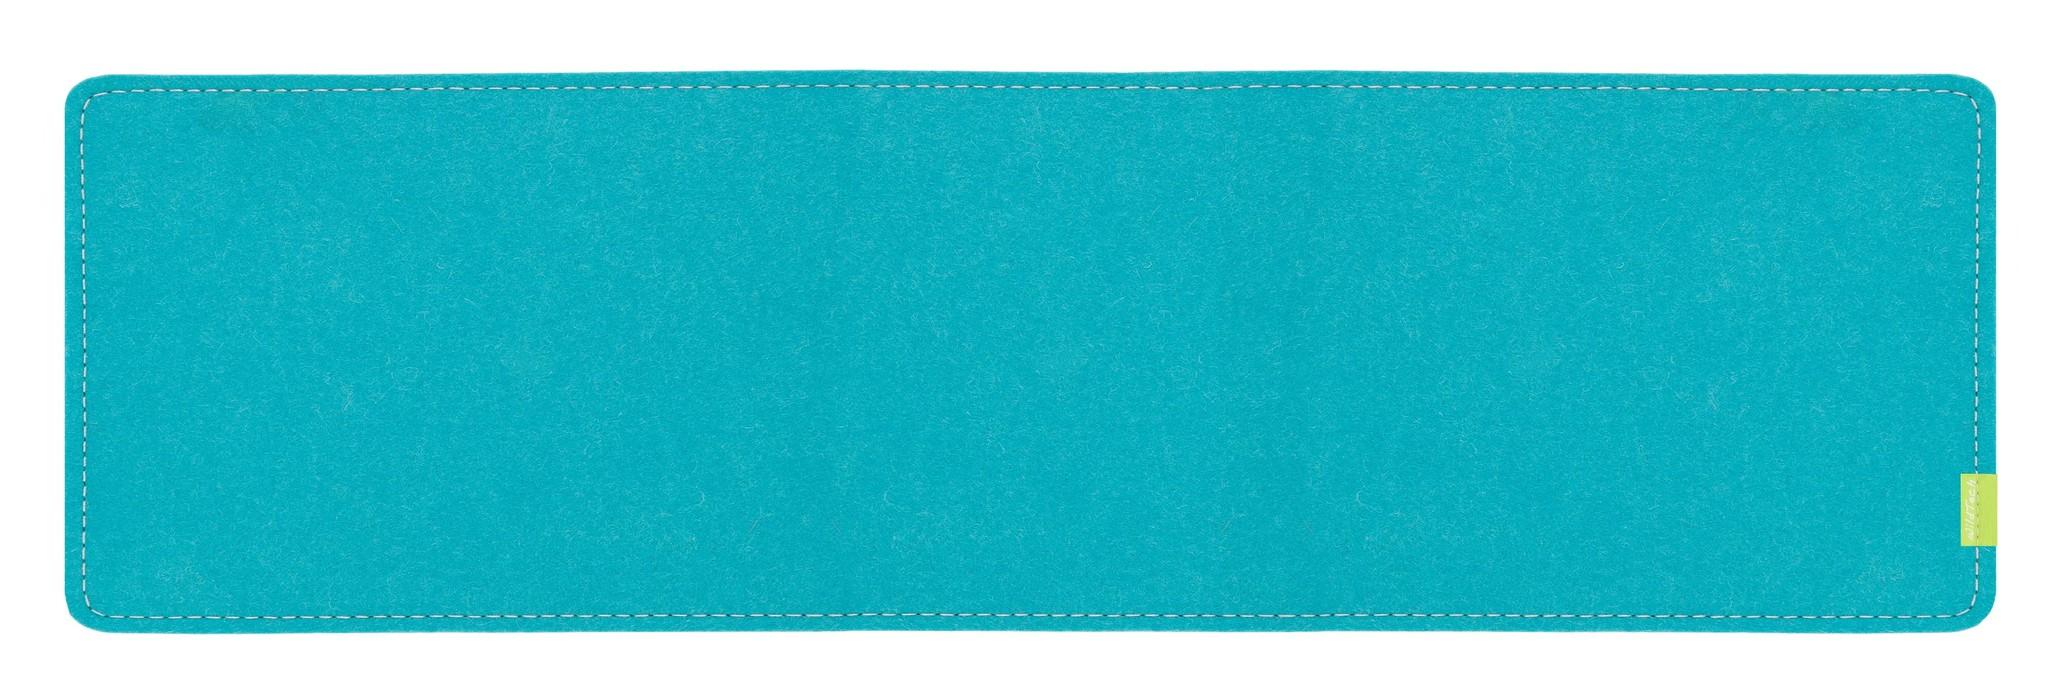 Underlay Turquoise-1